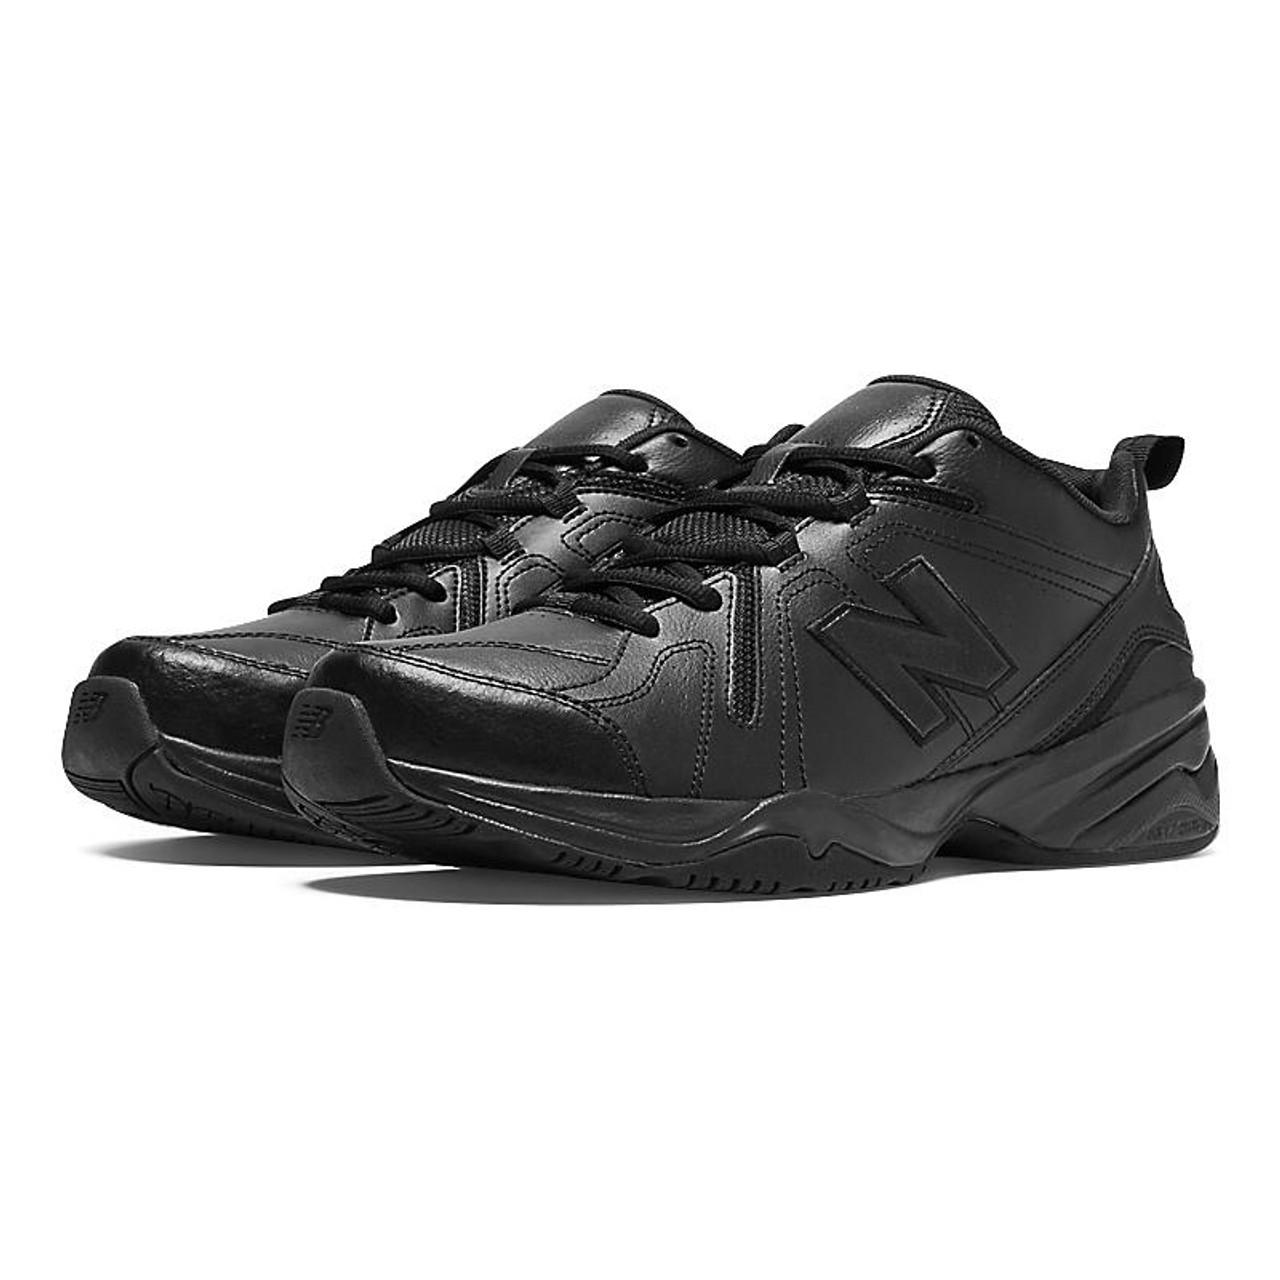 New Balance 608v4 Cross Training Shoe